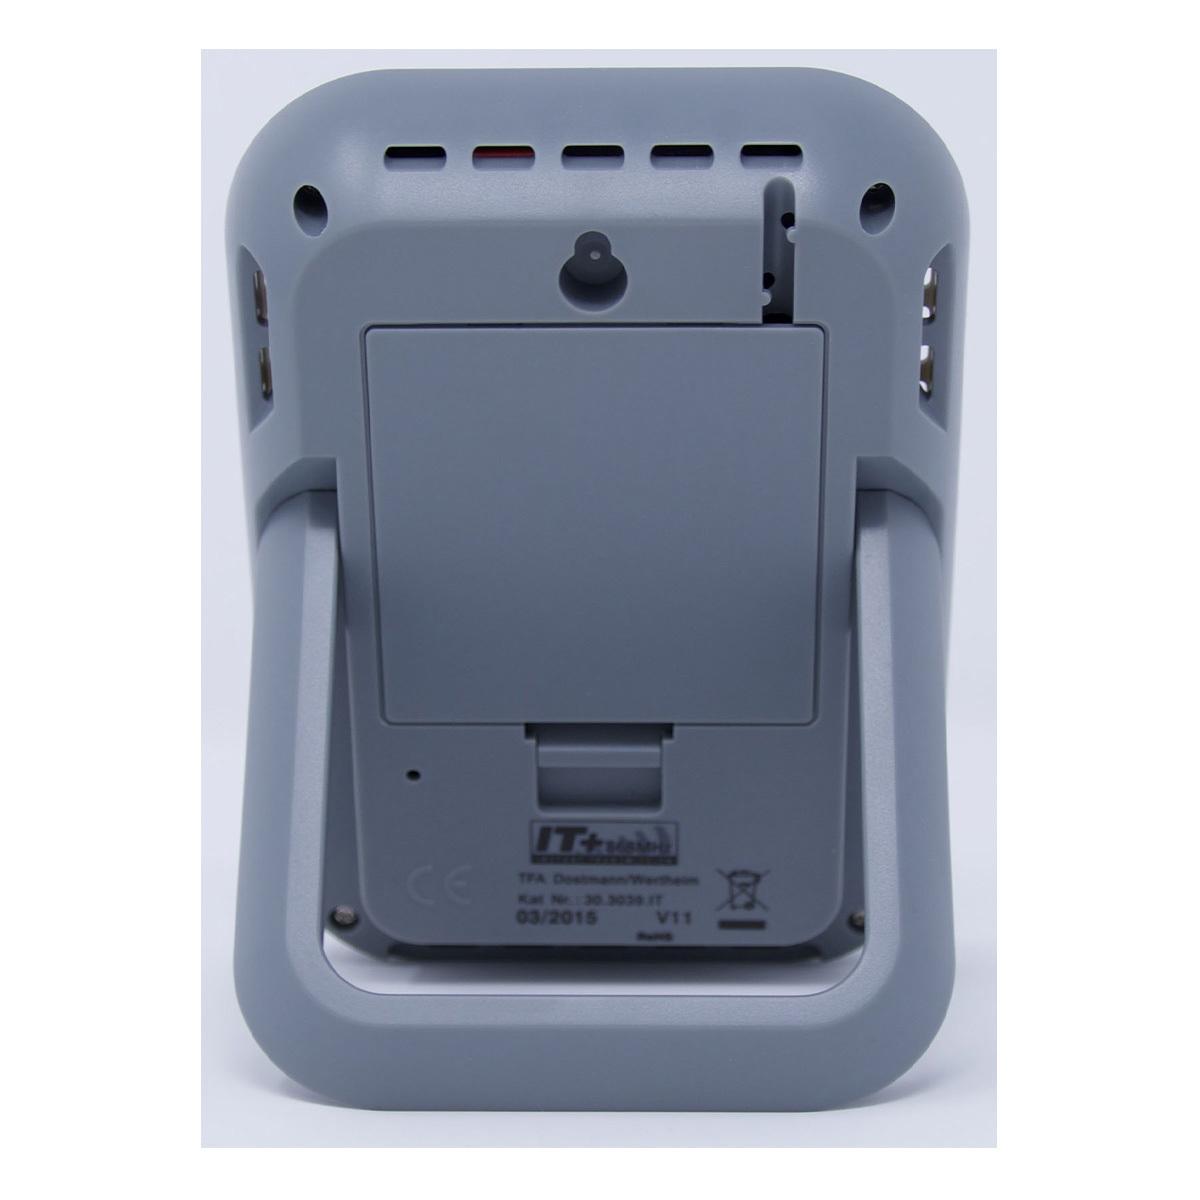 30-3039-it-profi-thermo-hygrometer-mit-datenlogger-funktion-klimalogg-pro-ansicht2-1200x1200px.jpg